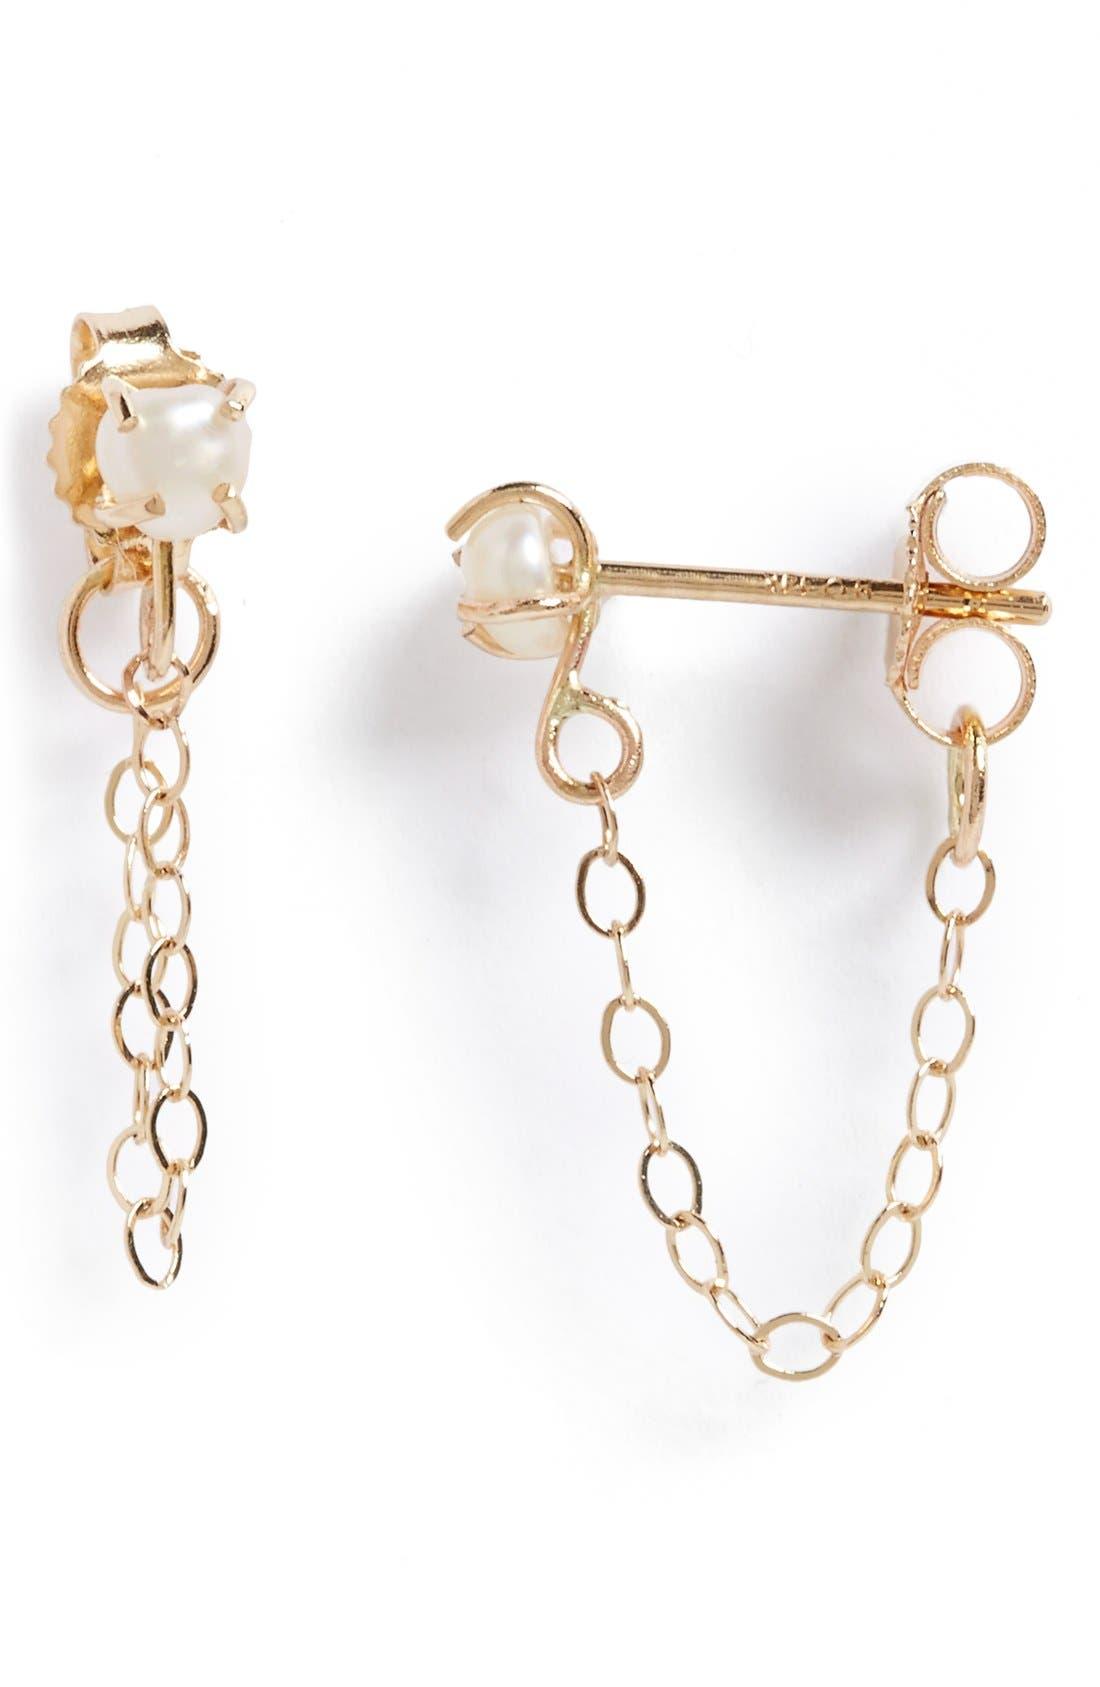 Main Image - Melissa Joy Manning Keshi Pearl Ear Chains